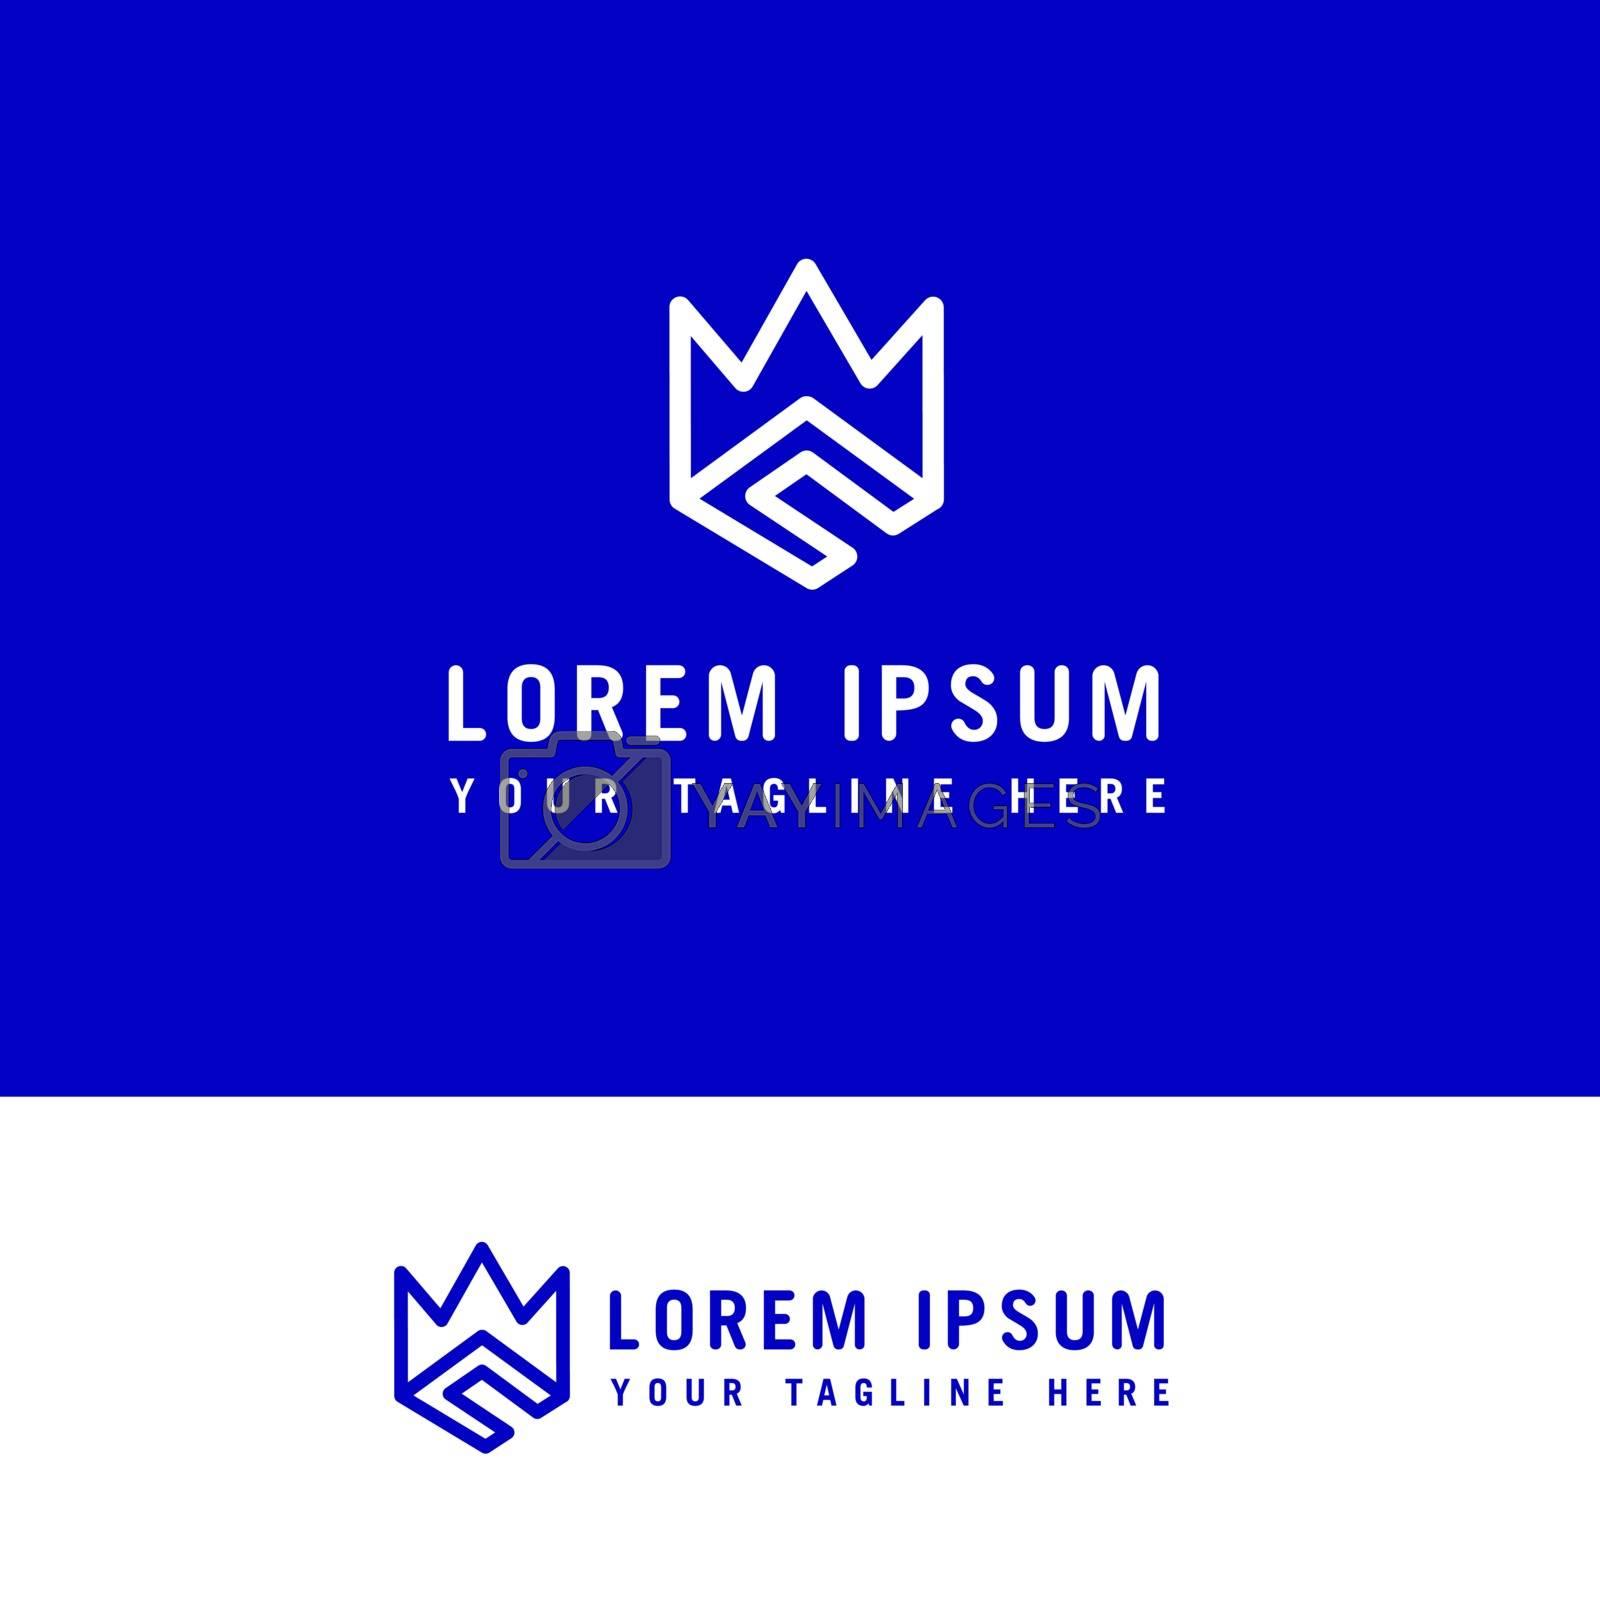 C crown logo icon , creative and minimal line art